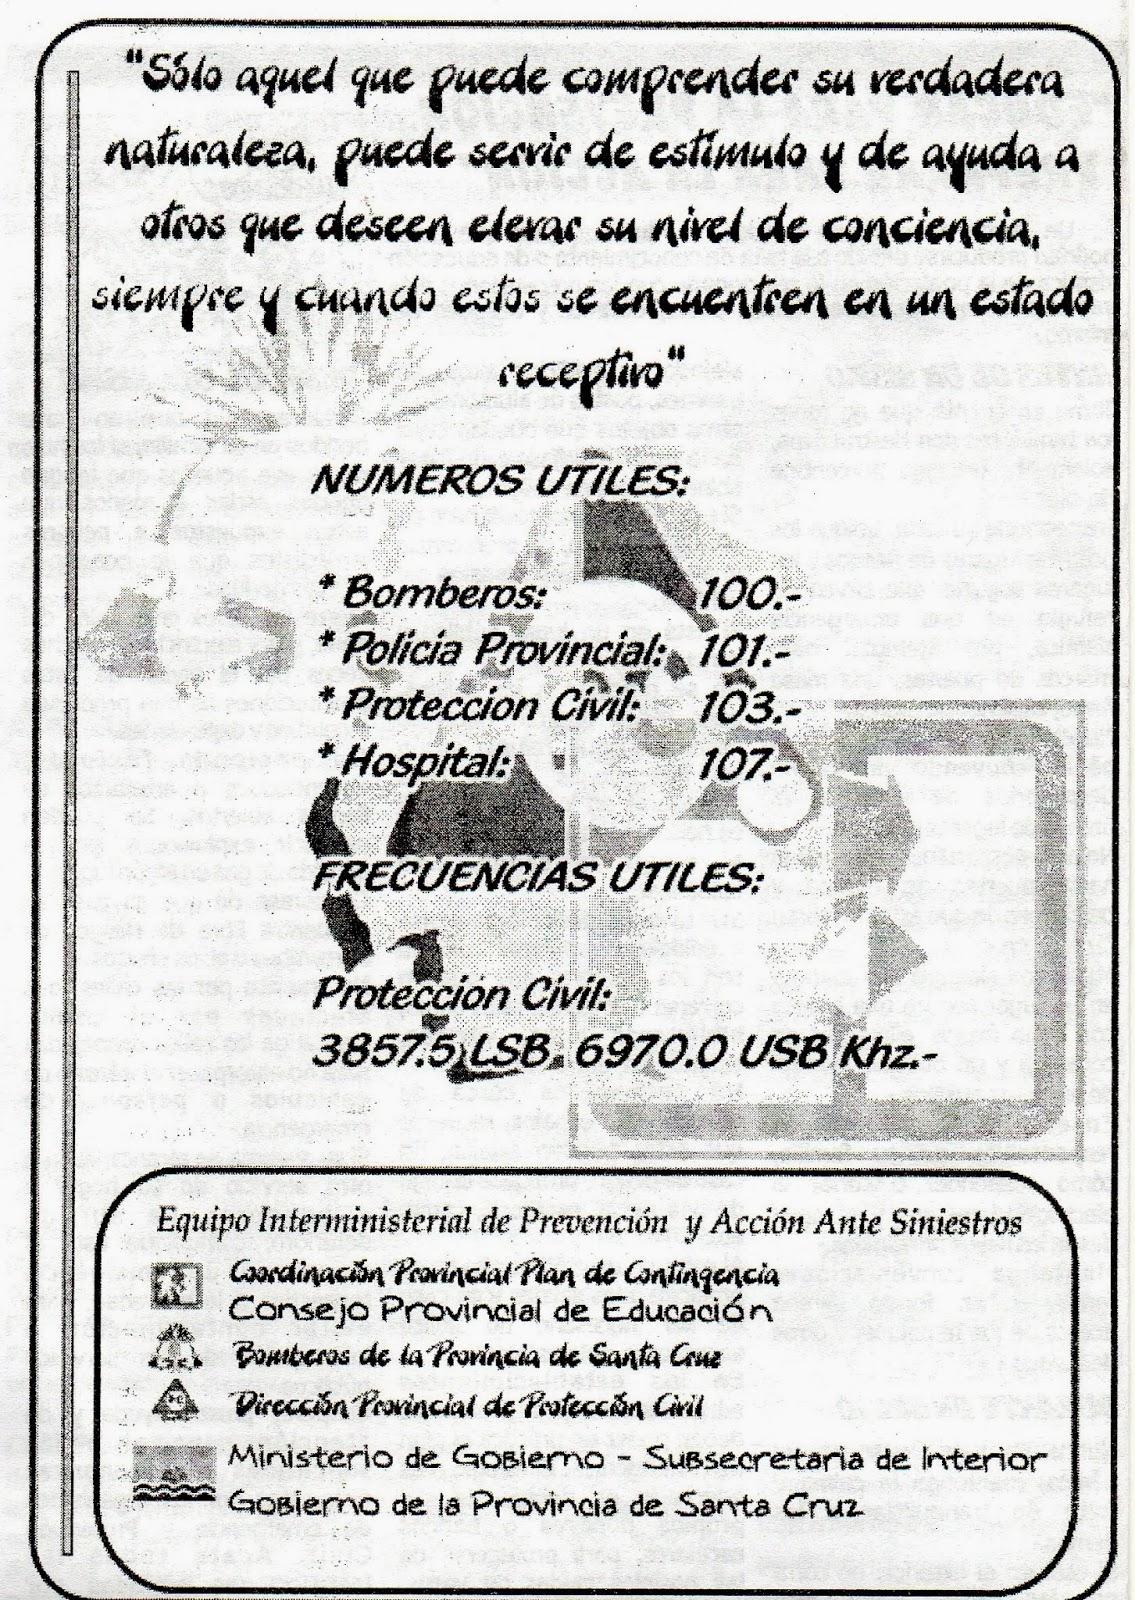 Colegio Secundario Provincial Nº 37: Mini Manual de